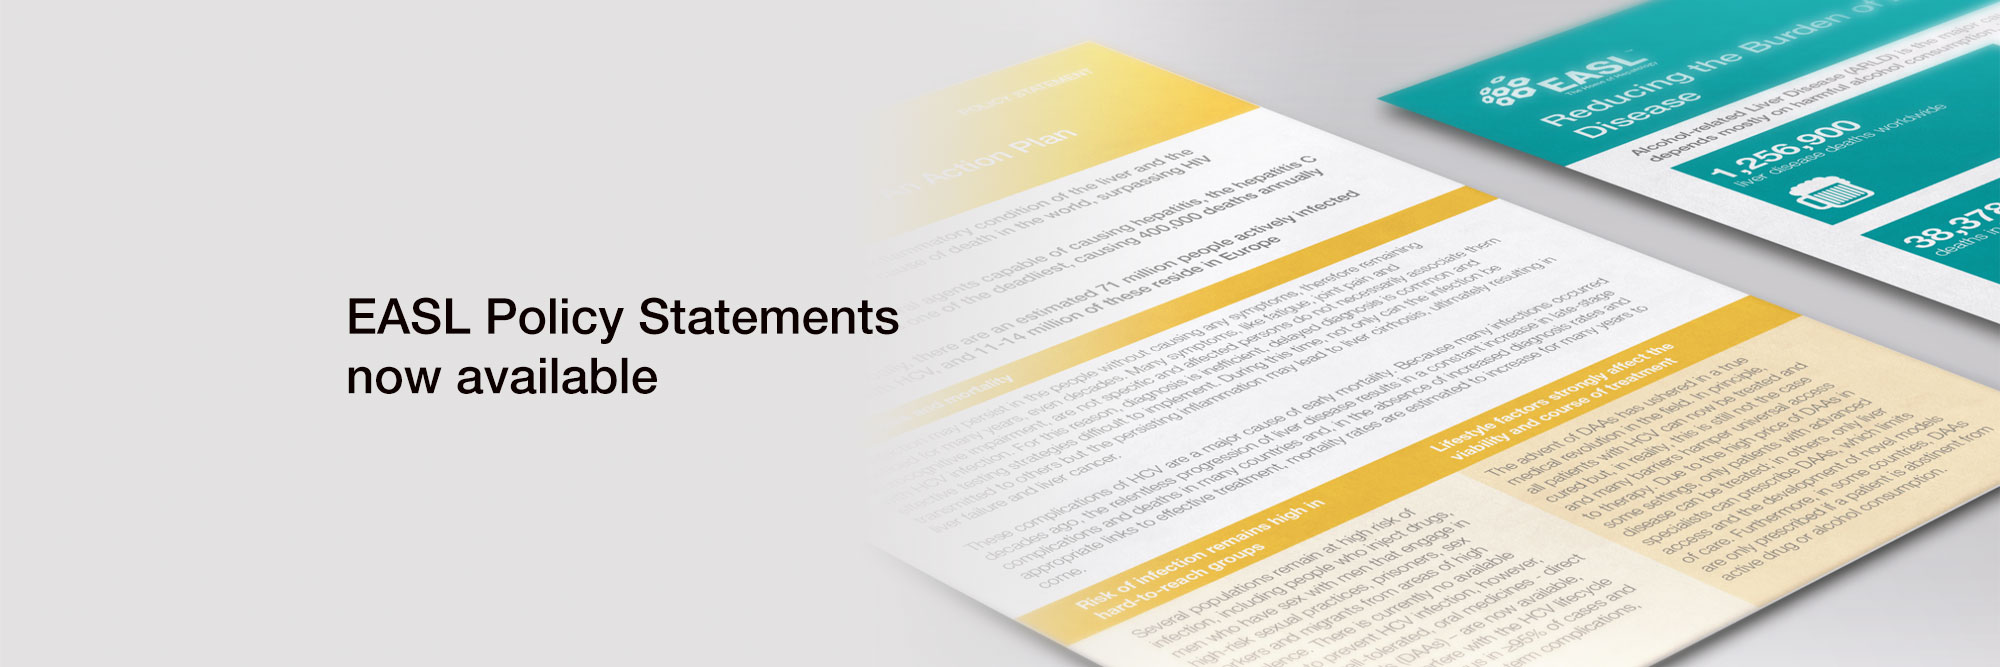 easl-policy-statements-slider-easl